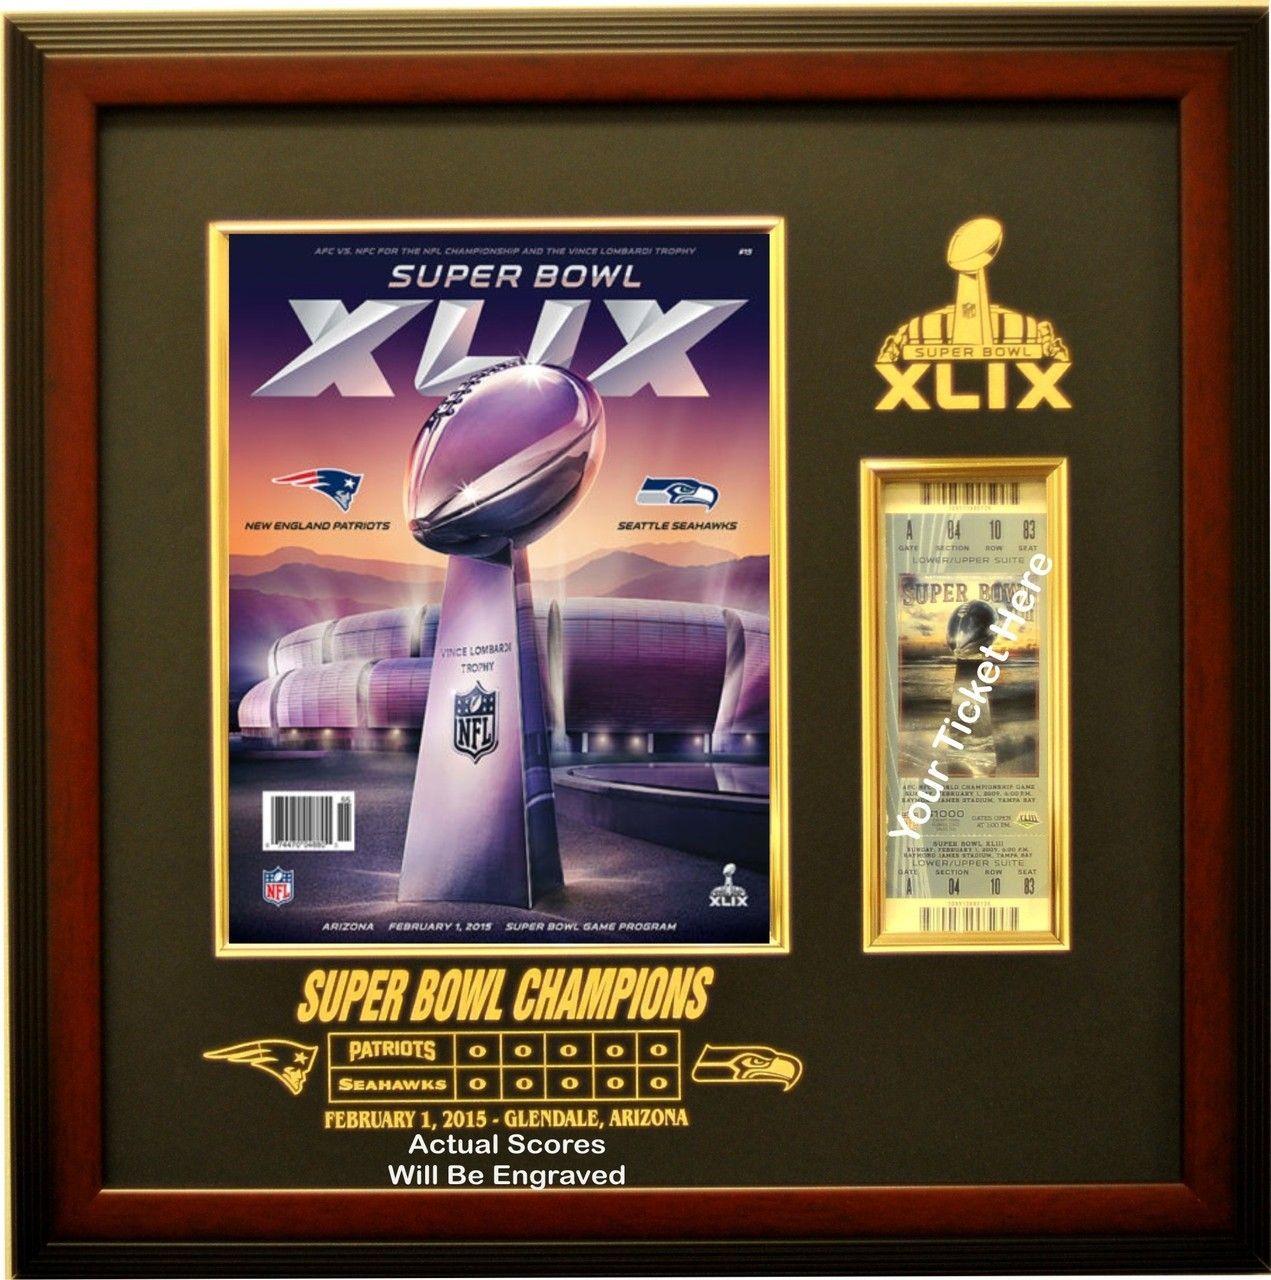 Aaa sports memorabilia llc seattle seahawks super bowl 49 ticket aaa sports memorabilia llc seattle seahawks super bowl 49 ticket a great way to jeuxipadfo Choice Image